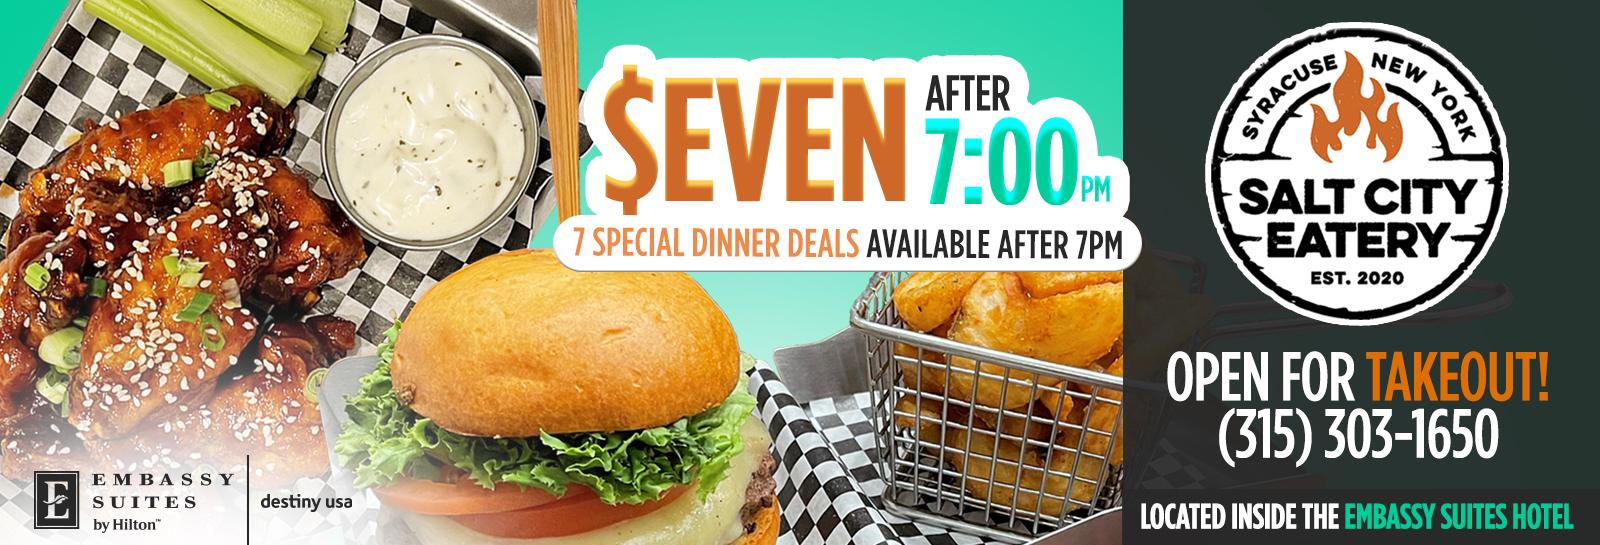 2020 12 21 HOTEL FOOD SLIDER